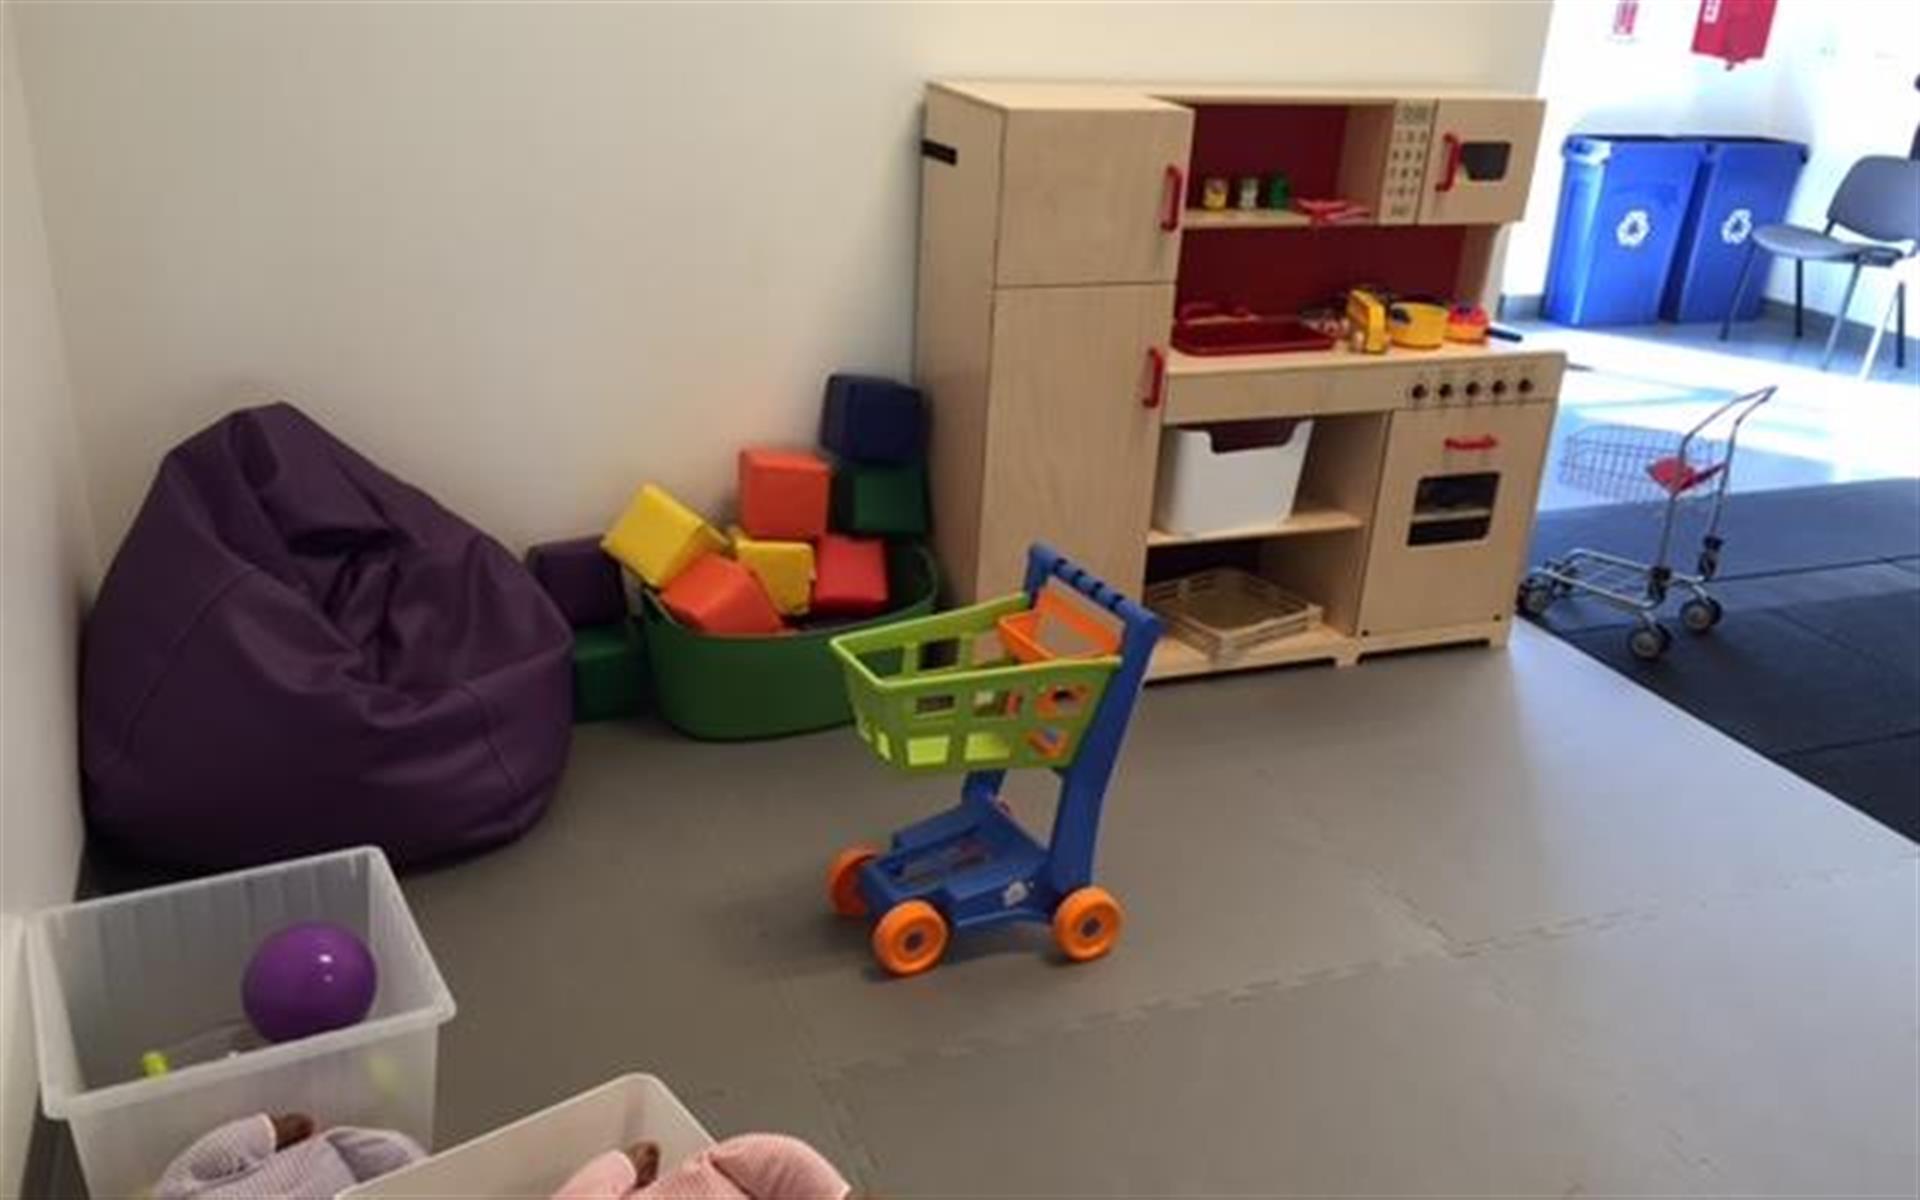 SensationAll Kids Gym - Pediatric Therapy Office Space (Copy)